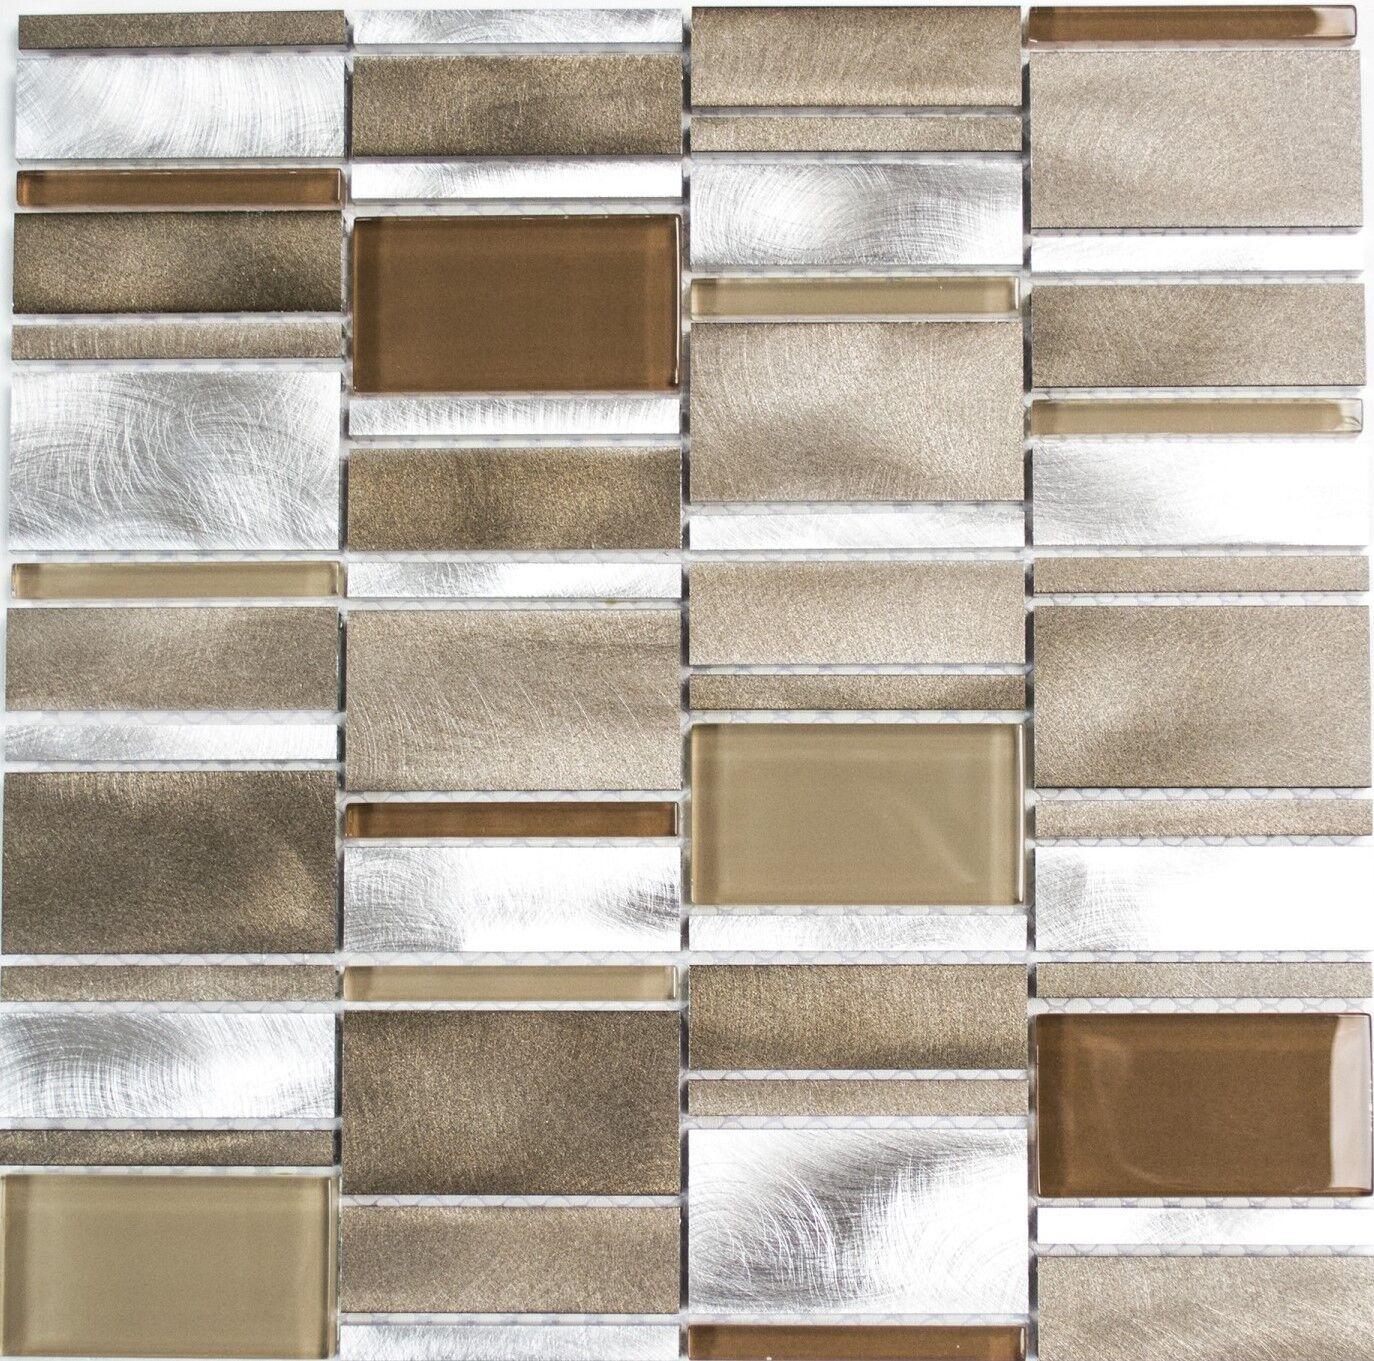 Mosaik Fliese Aluminium Transluzent Kombination Alu Glas   49-1202_f   10 Matten